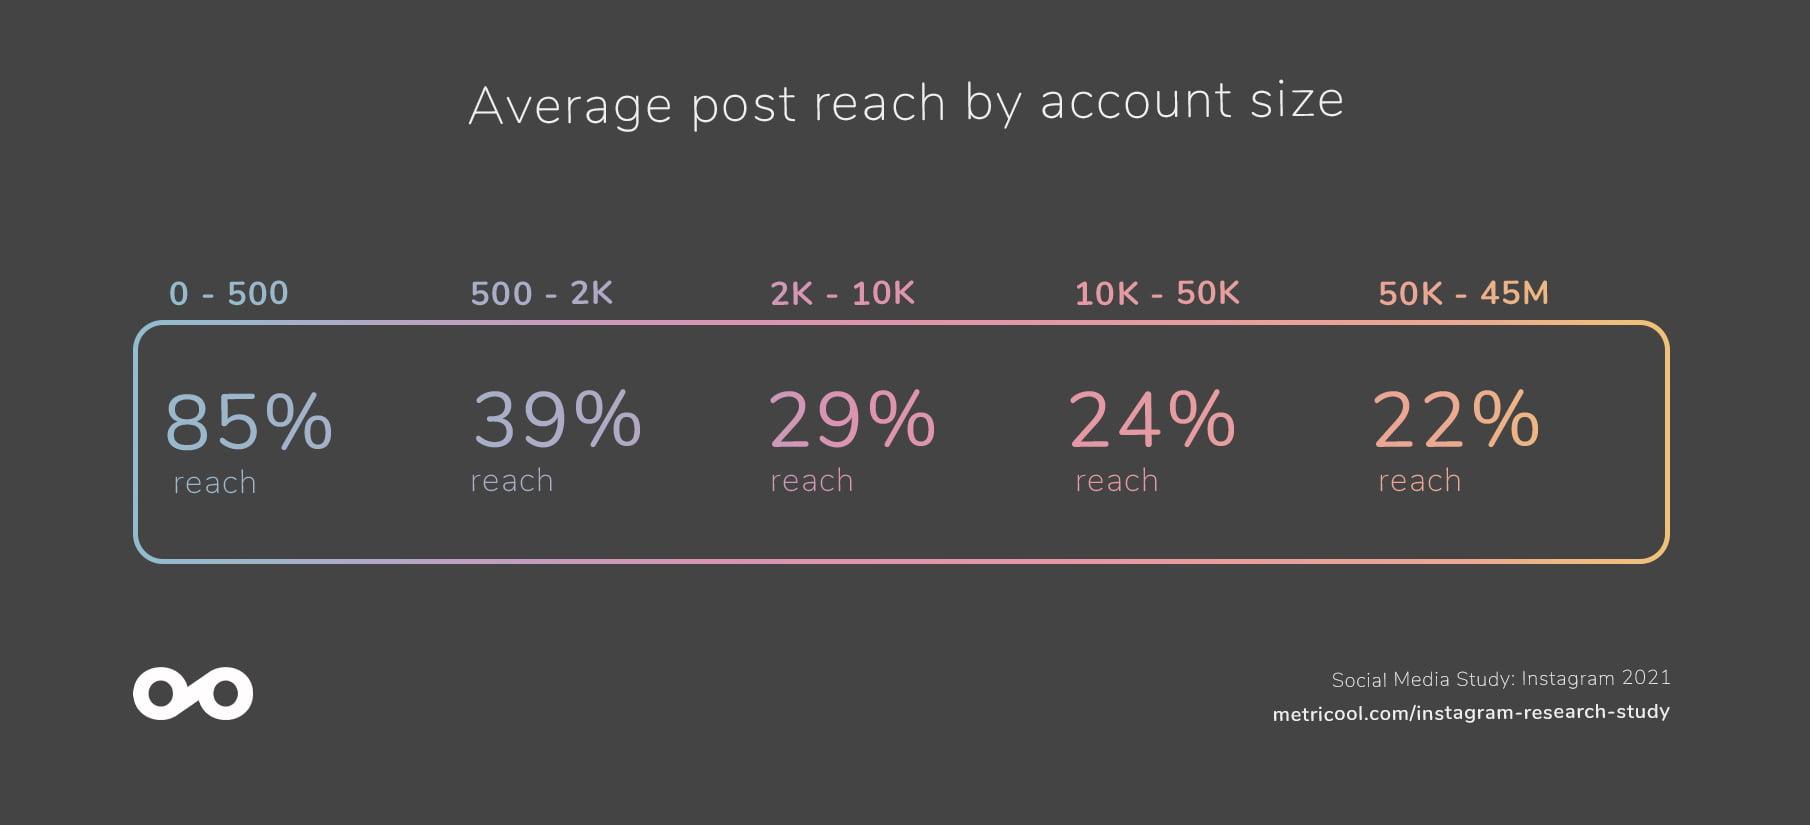 average post reach